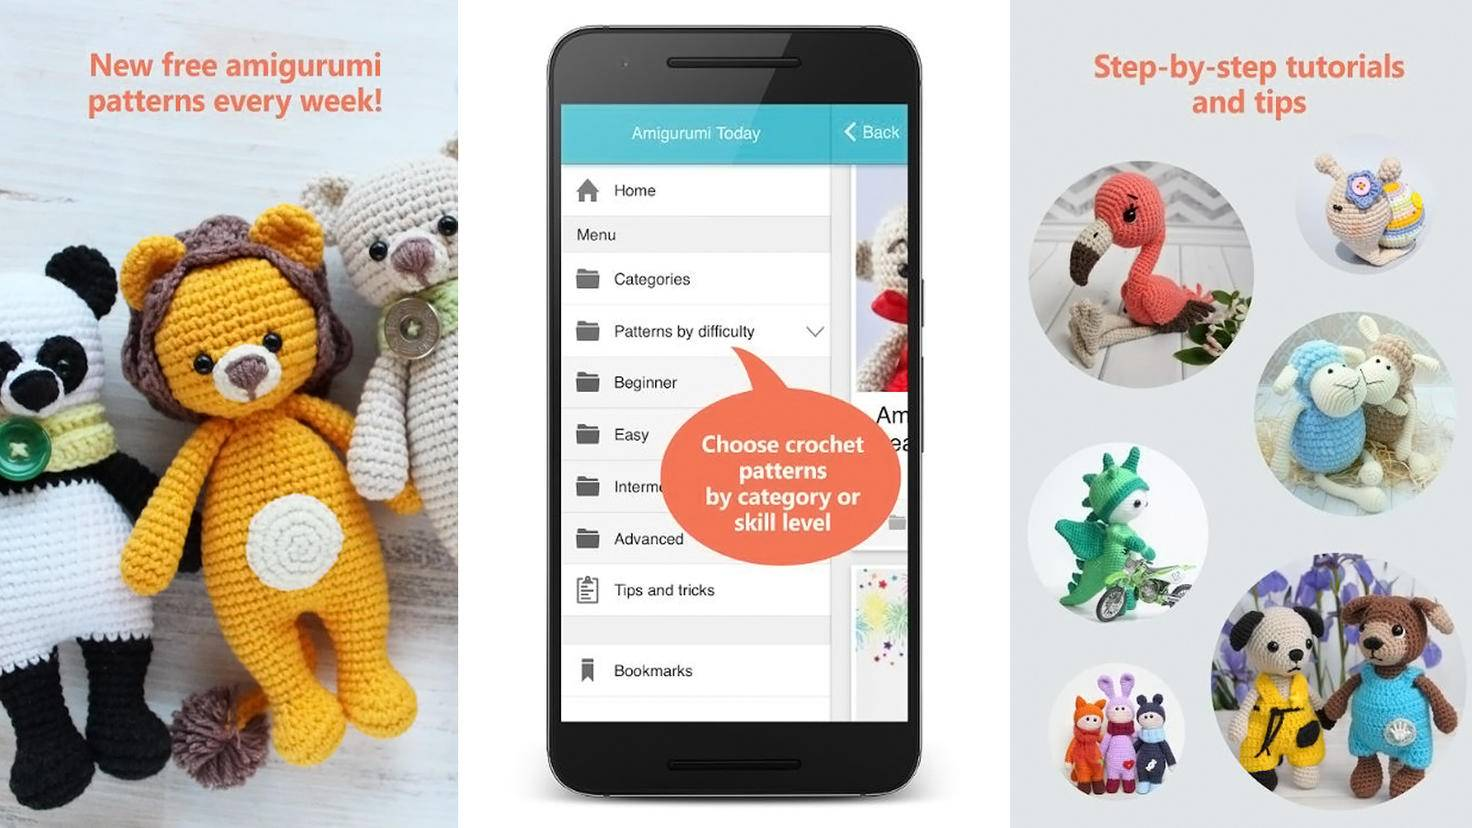 Amigurumi Today-Google Play Store-MimiCraft